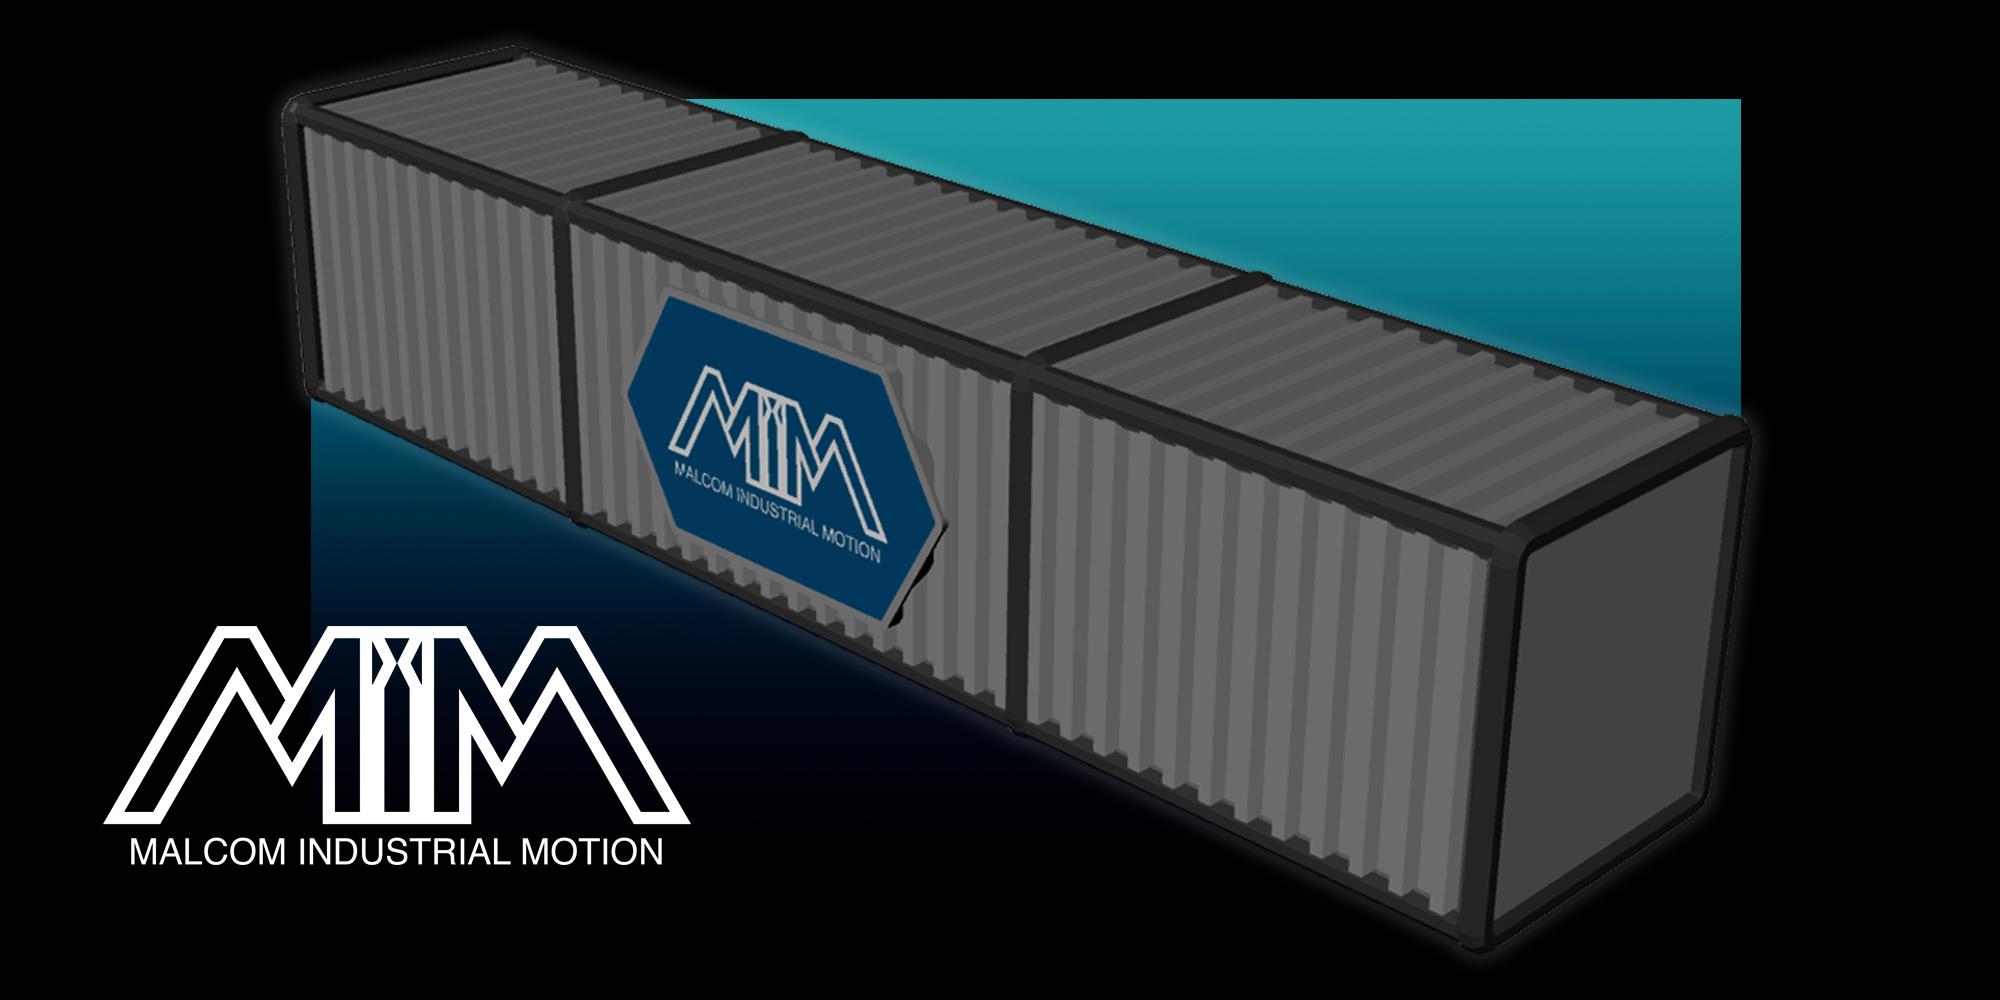 XX_lunar_transport_container_web.jpg